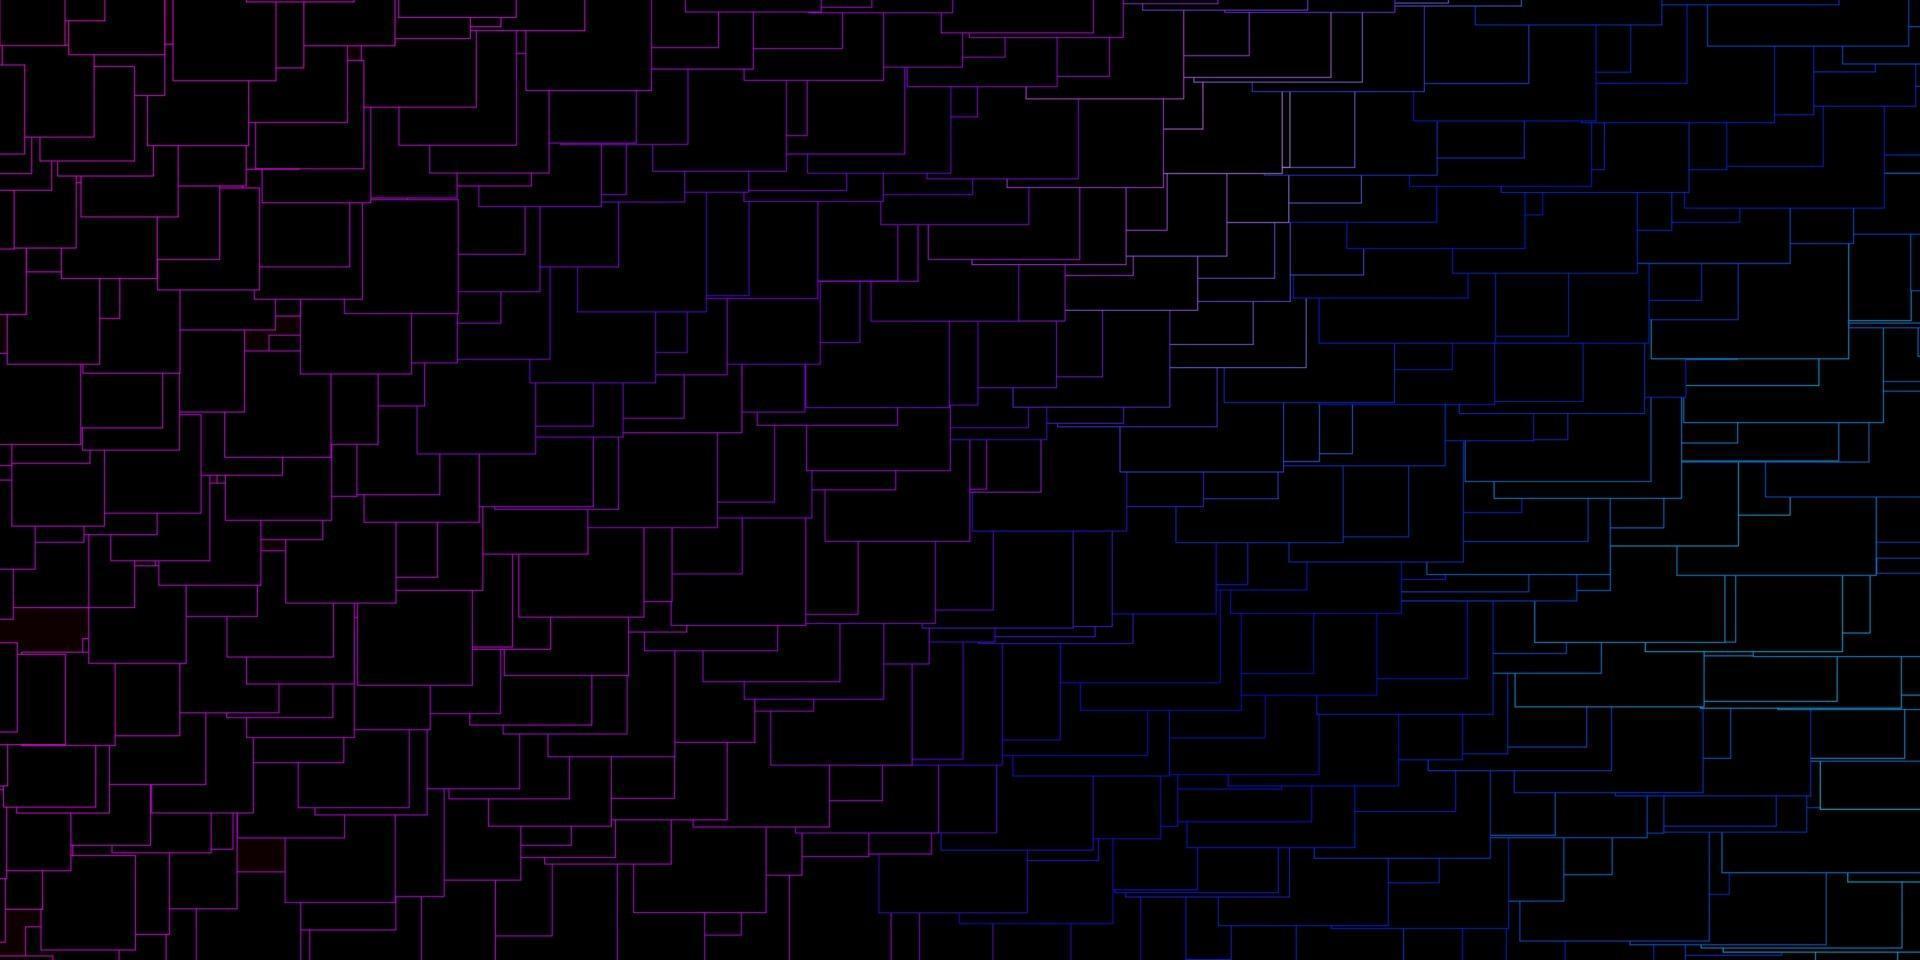 textura vector rosa escuro, azul em estilo retangular.